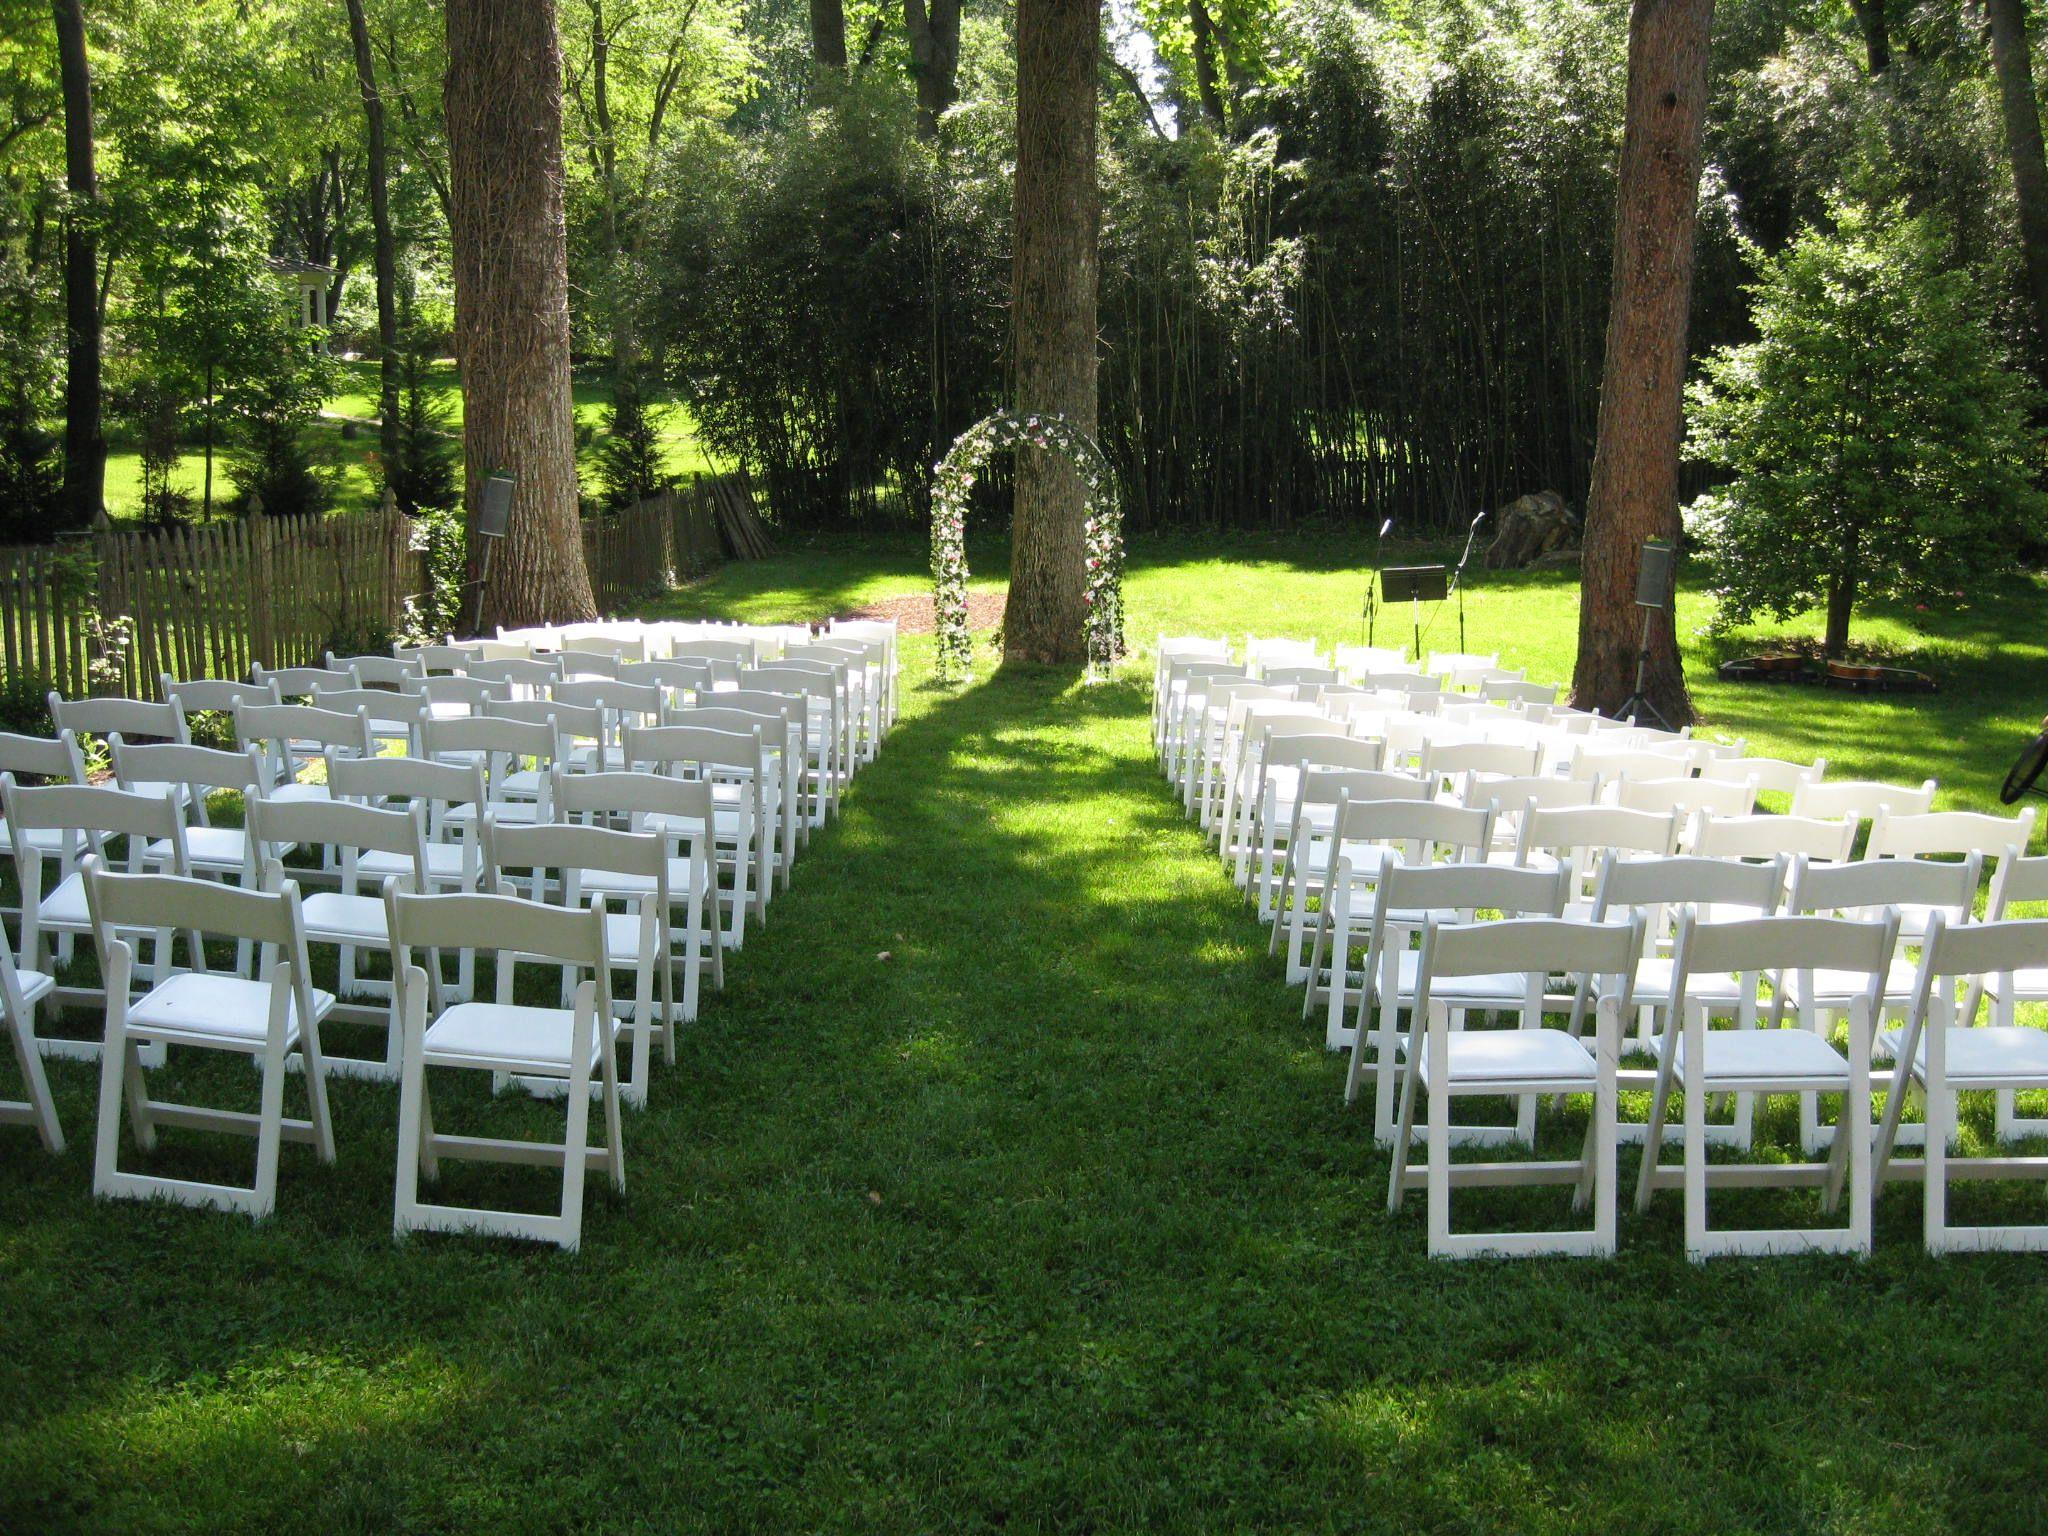 Superieur Beautiful Backyards Books | Brother`s Wedding U2013 May 23, 2009 : Move  Personal Training | Wedding Ideas | Pinterest | Backyard Weddings, Wedding  And Backyard ...